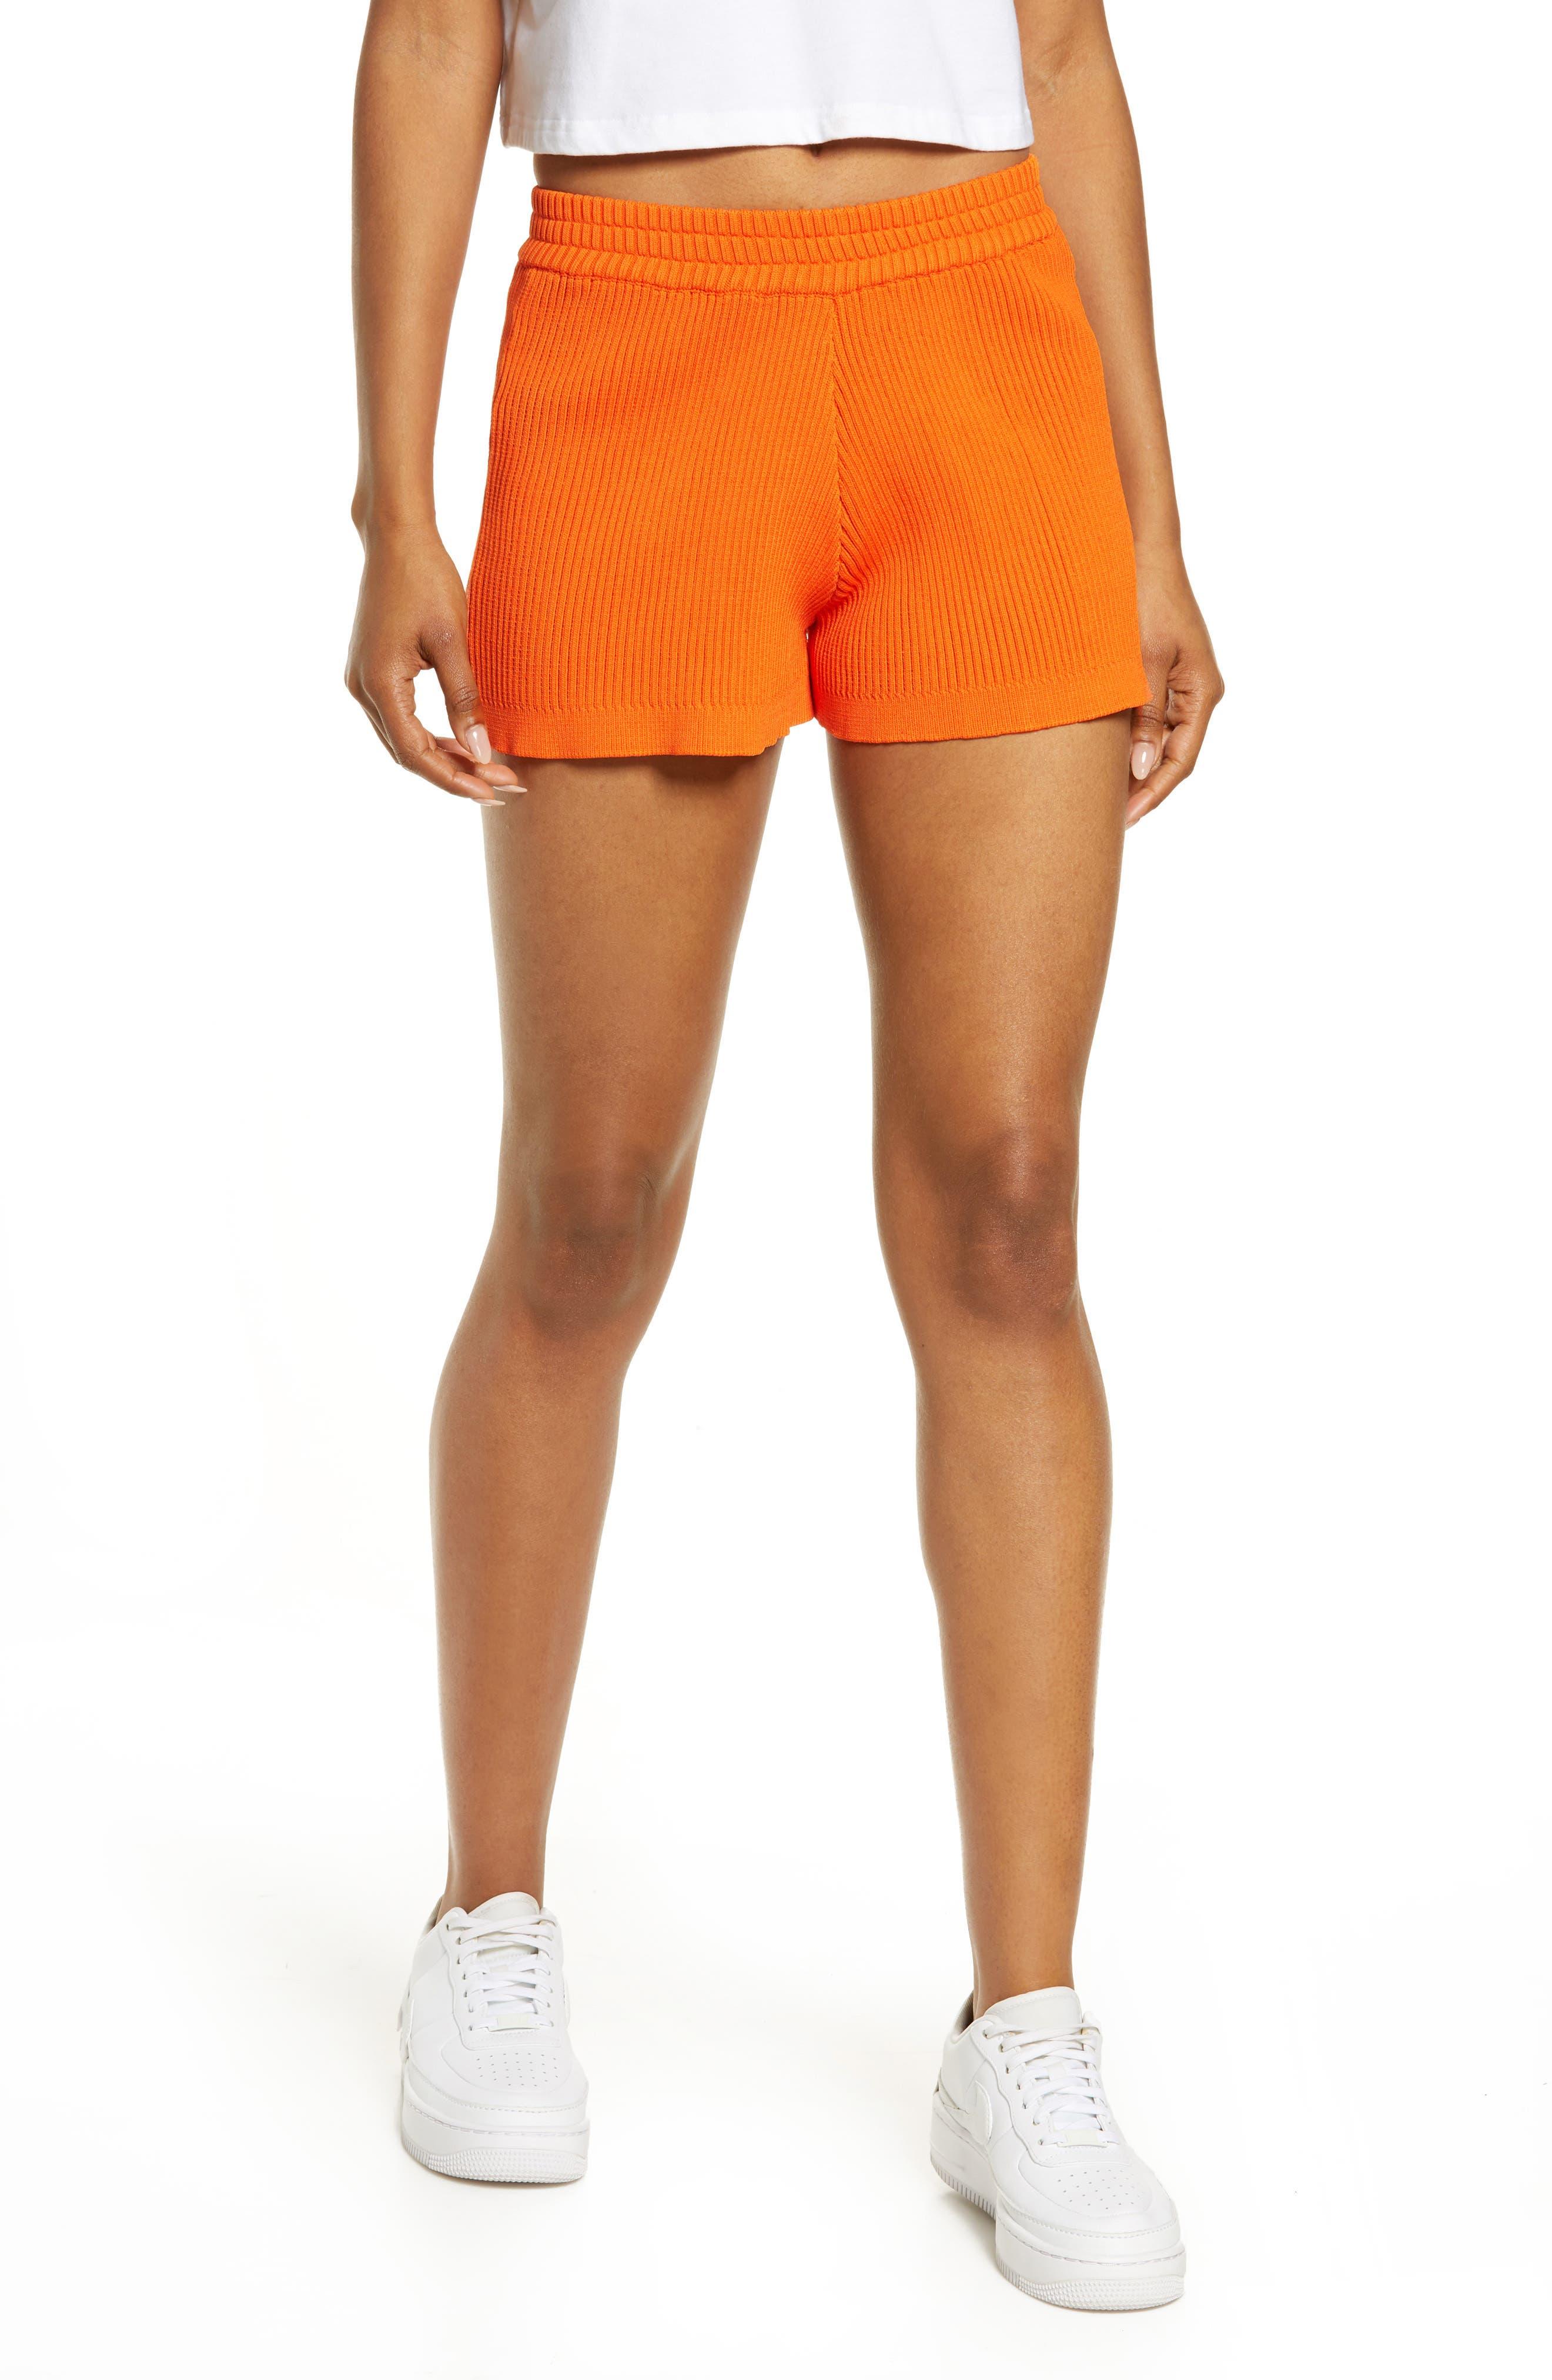 Women's By. dyln Eadie High Waist Rib Shorts